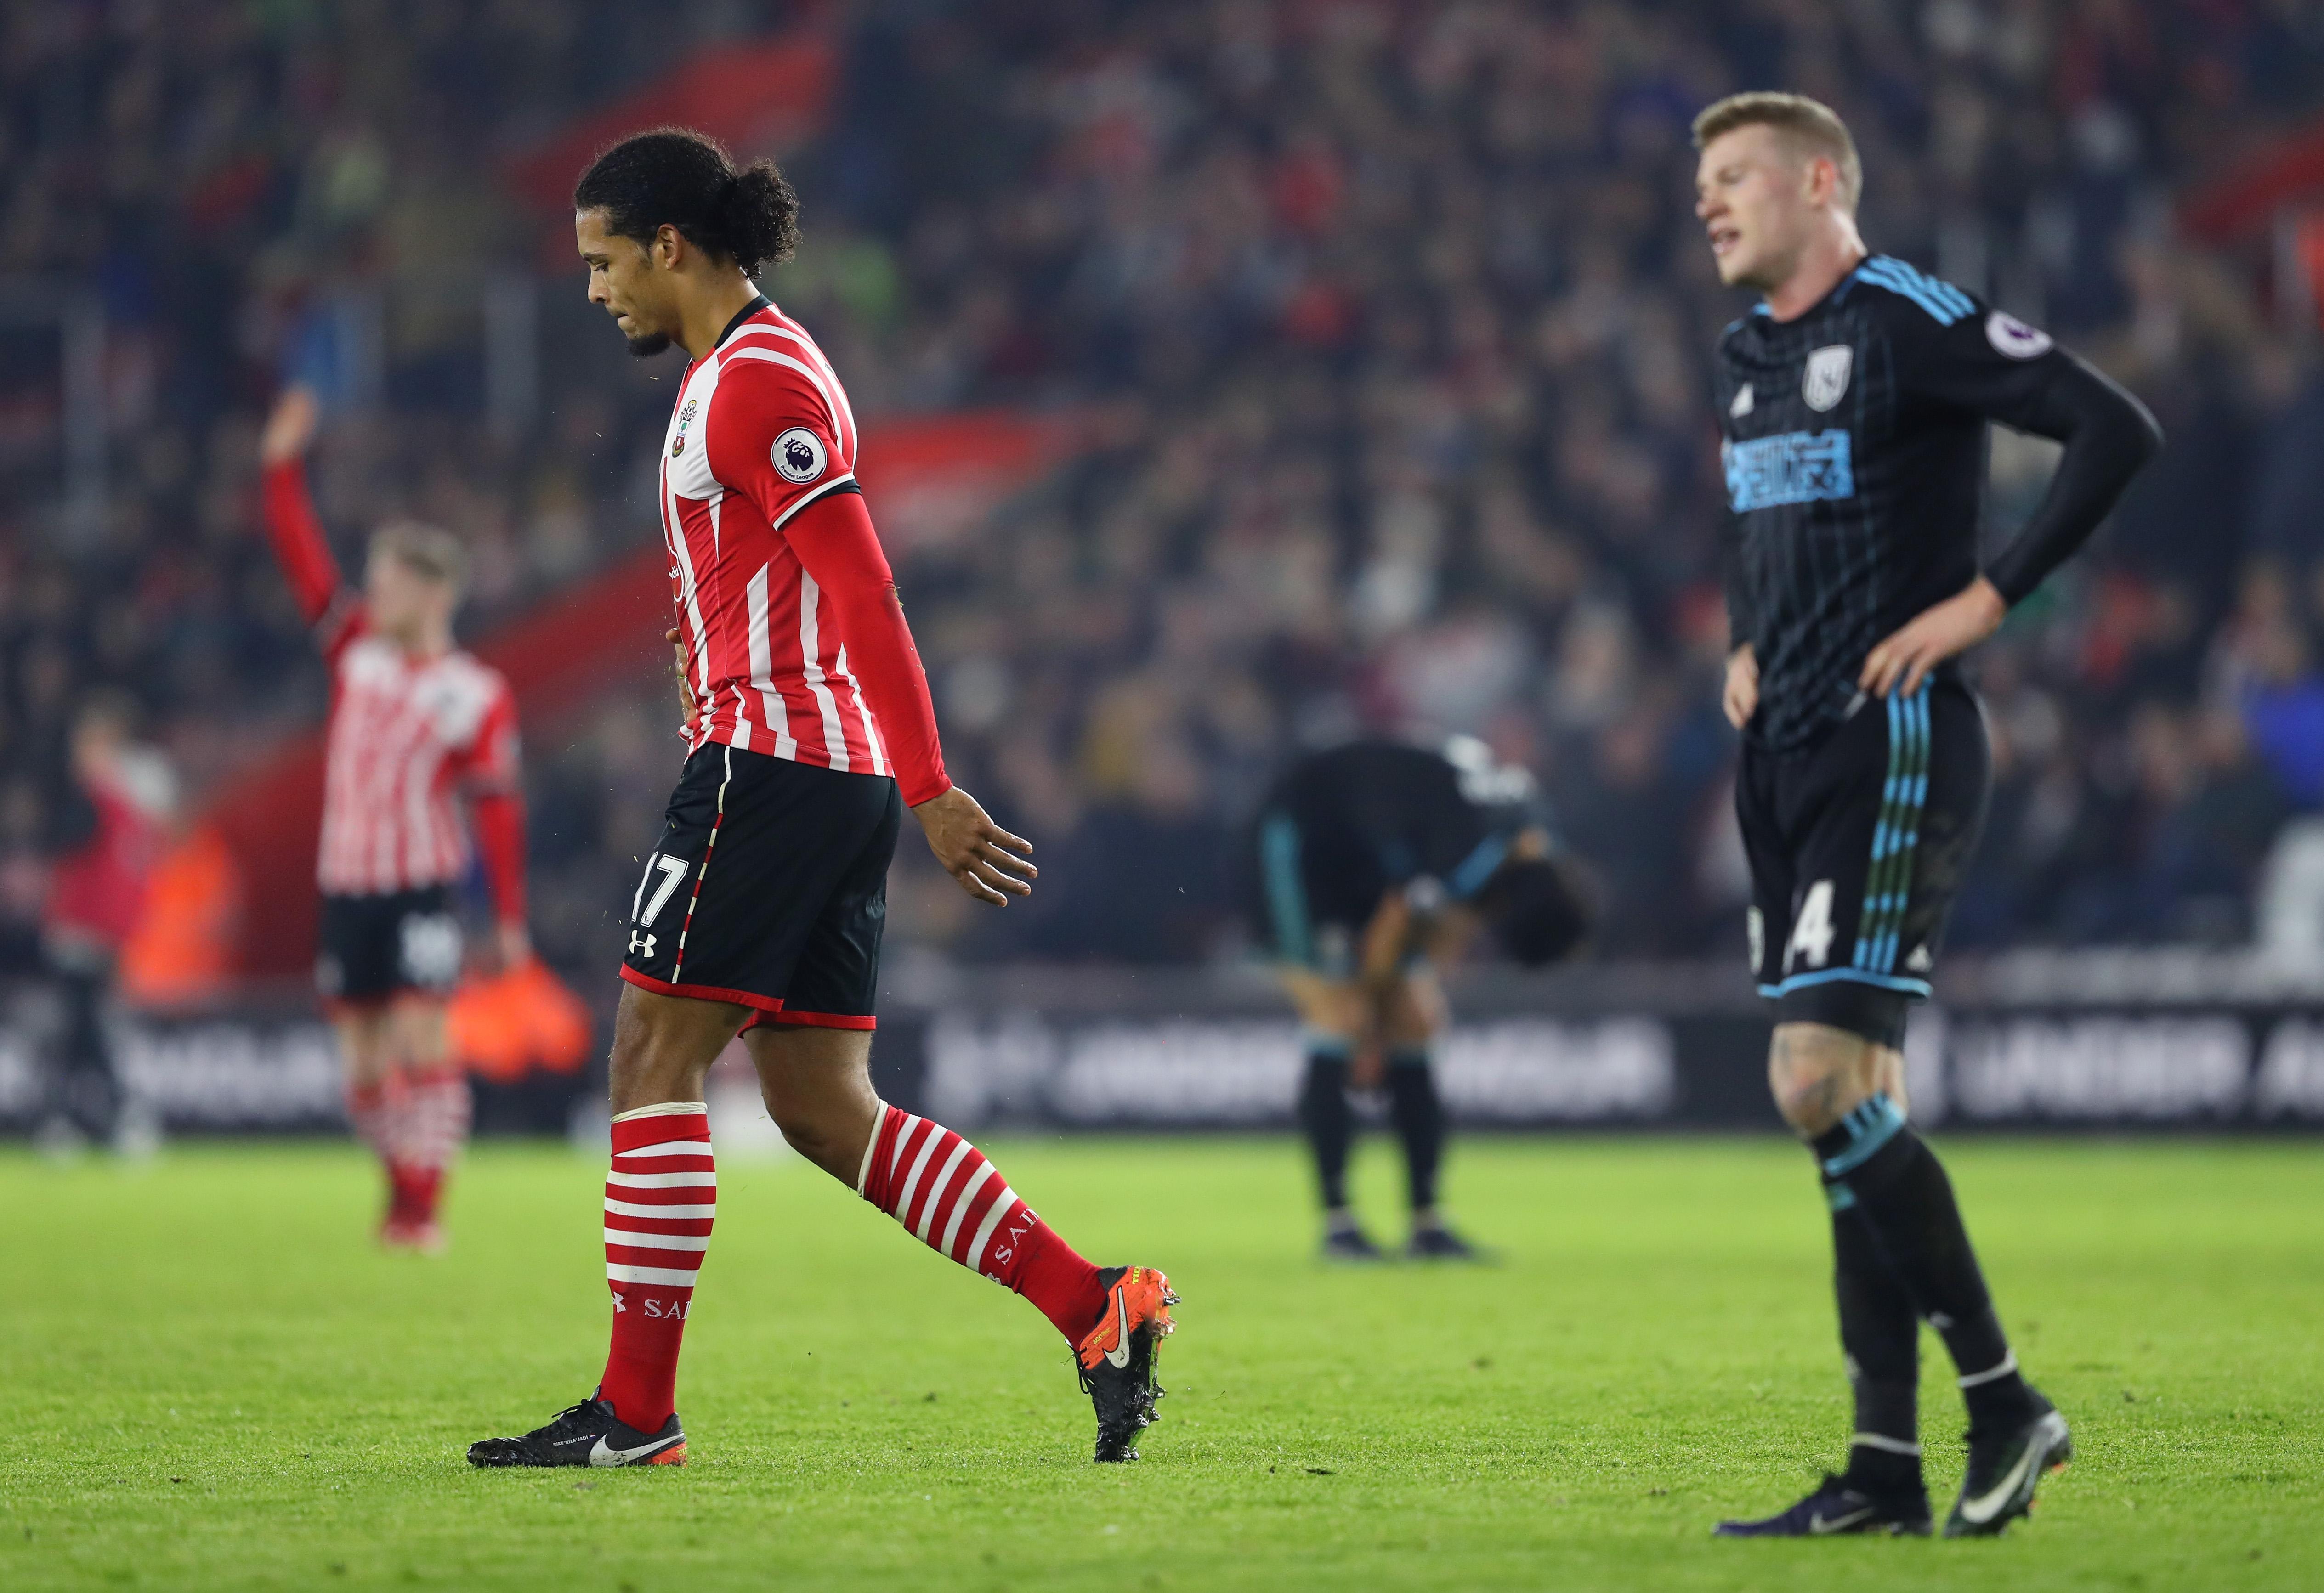 Romelu Lukaku and Virgil van Dijk should be targets, says John Hartson